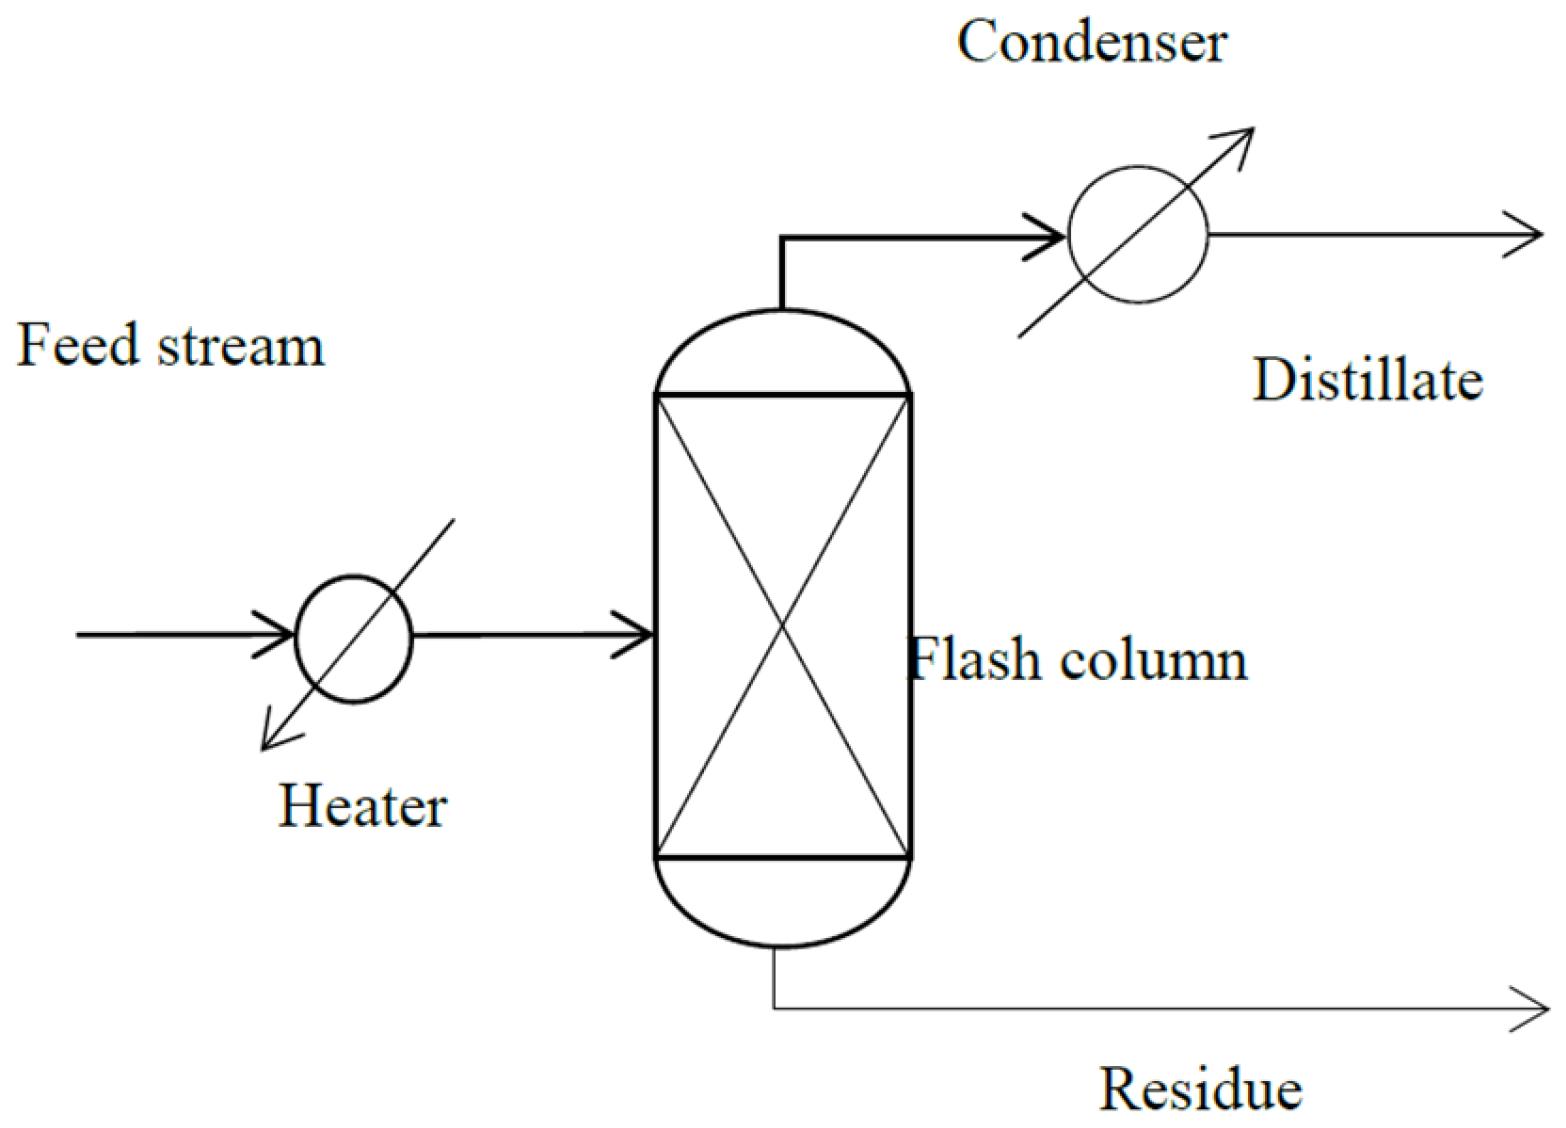 Processes | Free Full-Text | Development of Molecular Distillation